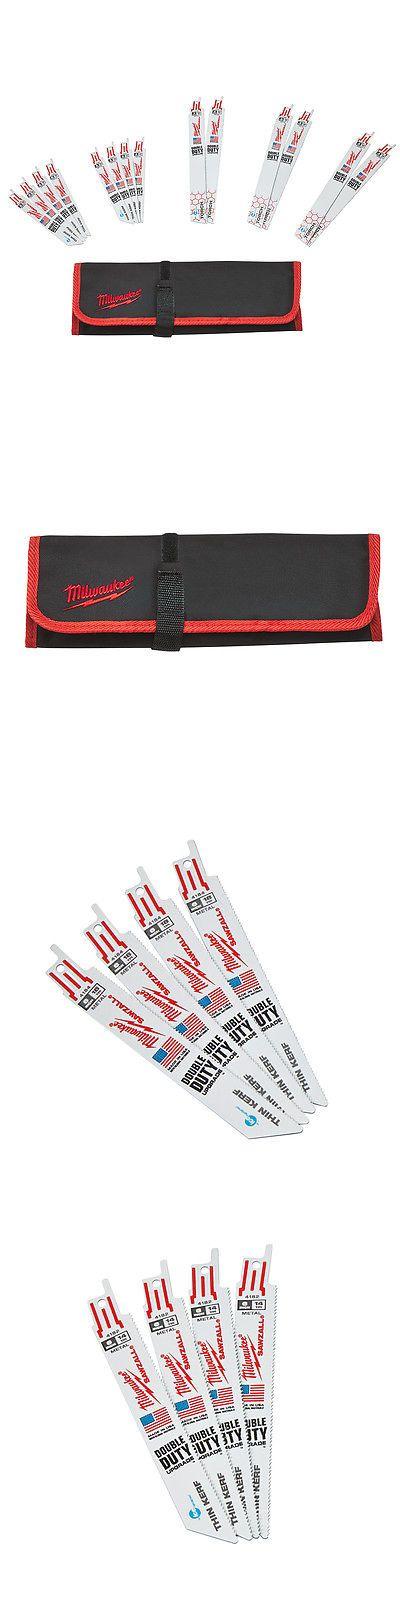 Saw Blades 122837: Milwaukee 49-22-1131 Ice Hardened Bi-Metal Cutting Sawzall Blade Set - 14Pc -> BUY IT NOW ONLY: $37 on eBay!